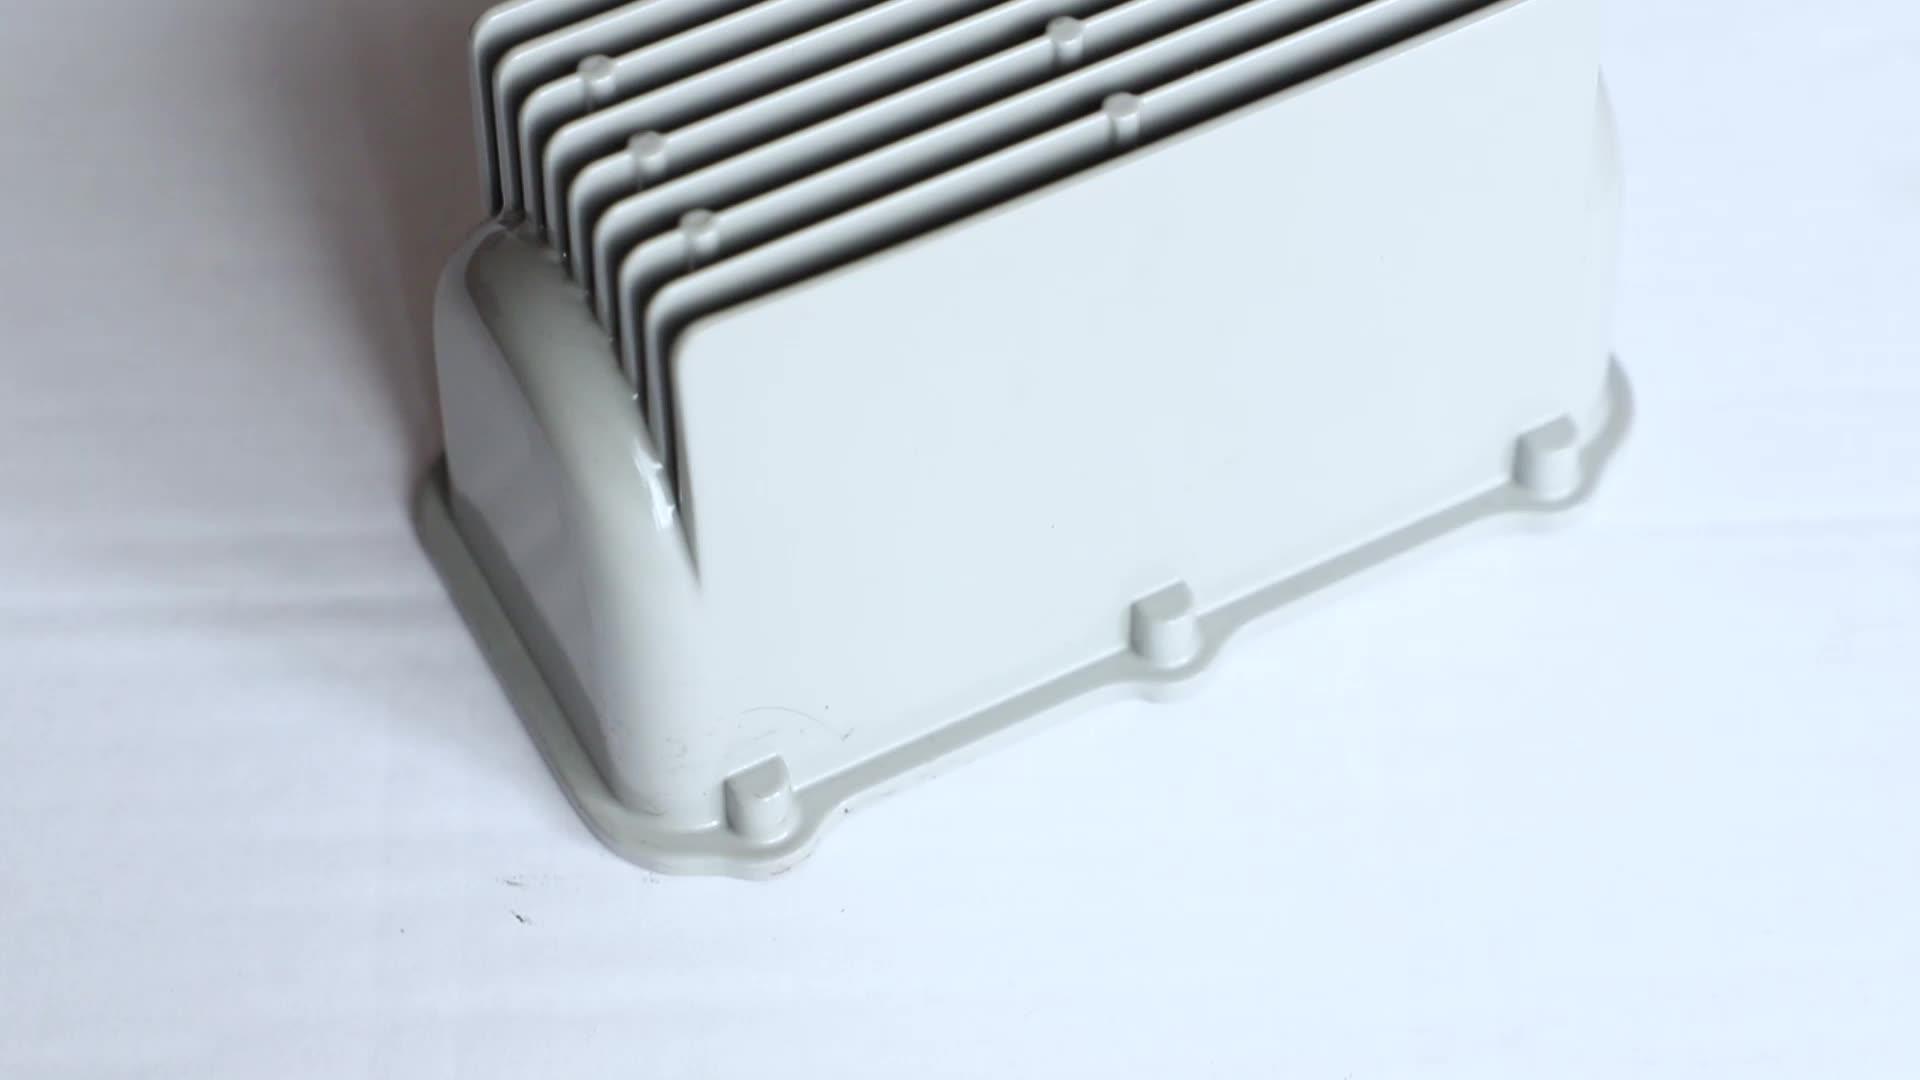 OEM angepasst aluminium druckguss form/injection mould